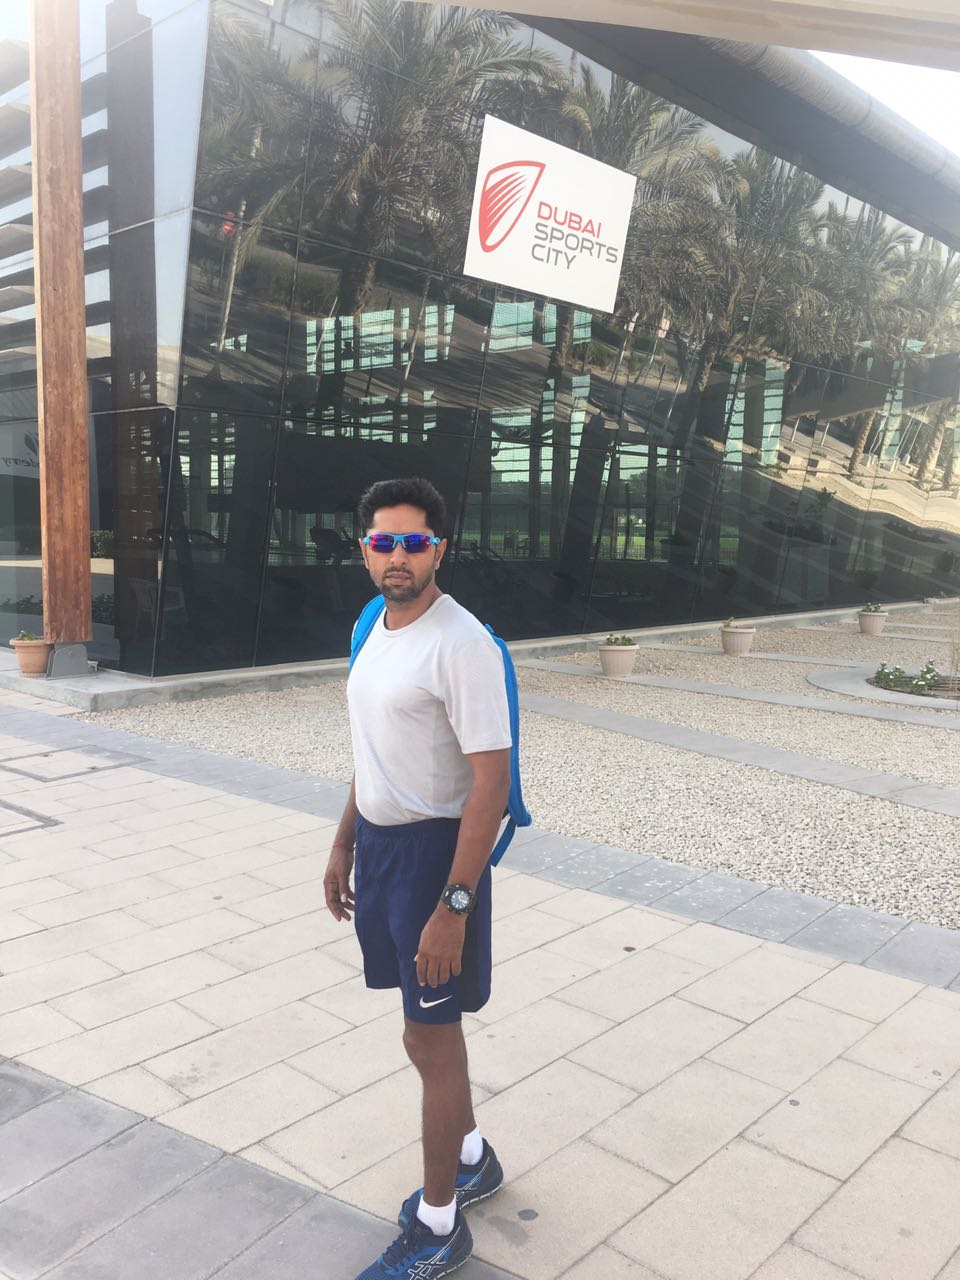 Certified Level 2 Coach from -ICC Mr. Sunil Giri